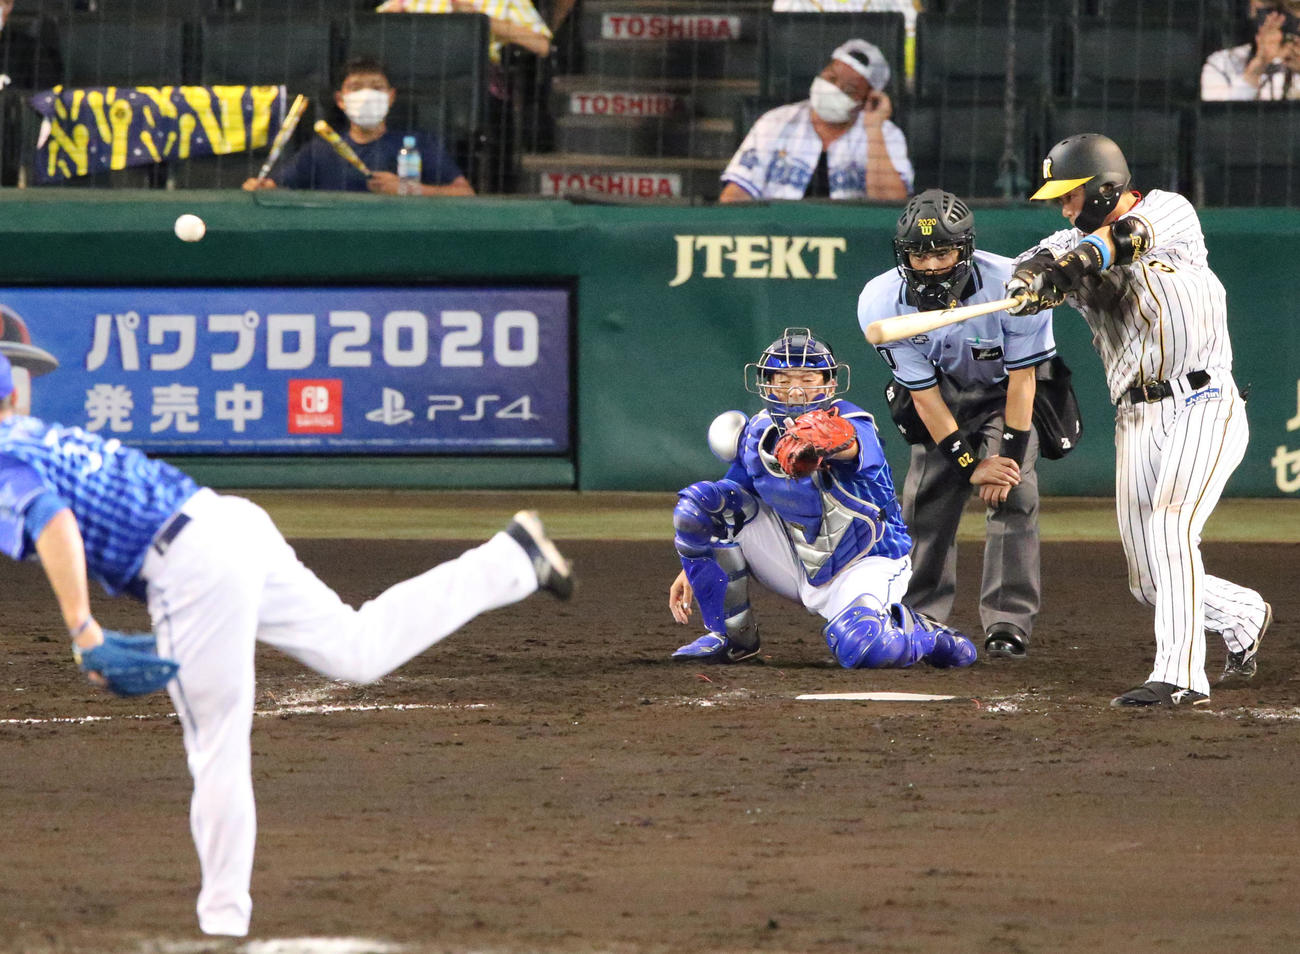 阪神対DeNA 8回裏阪神2死二塁、大山は右翼線に適時二塁打を放つ(撮影・上山淳一)